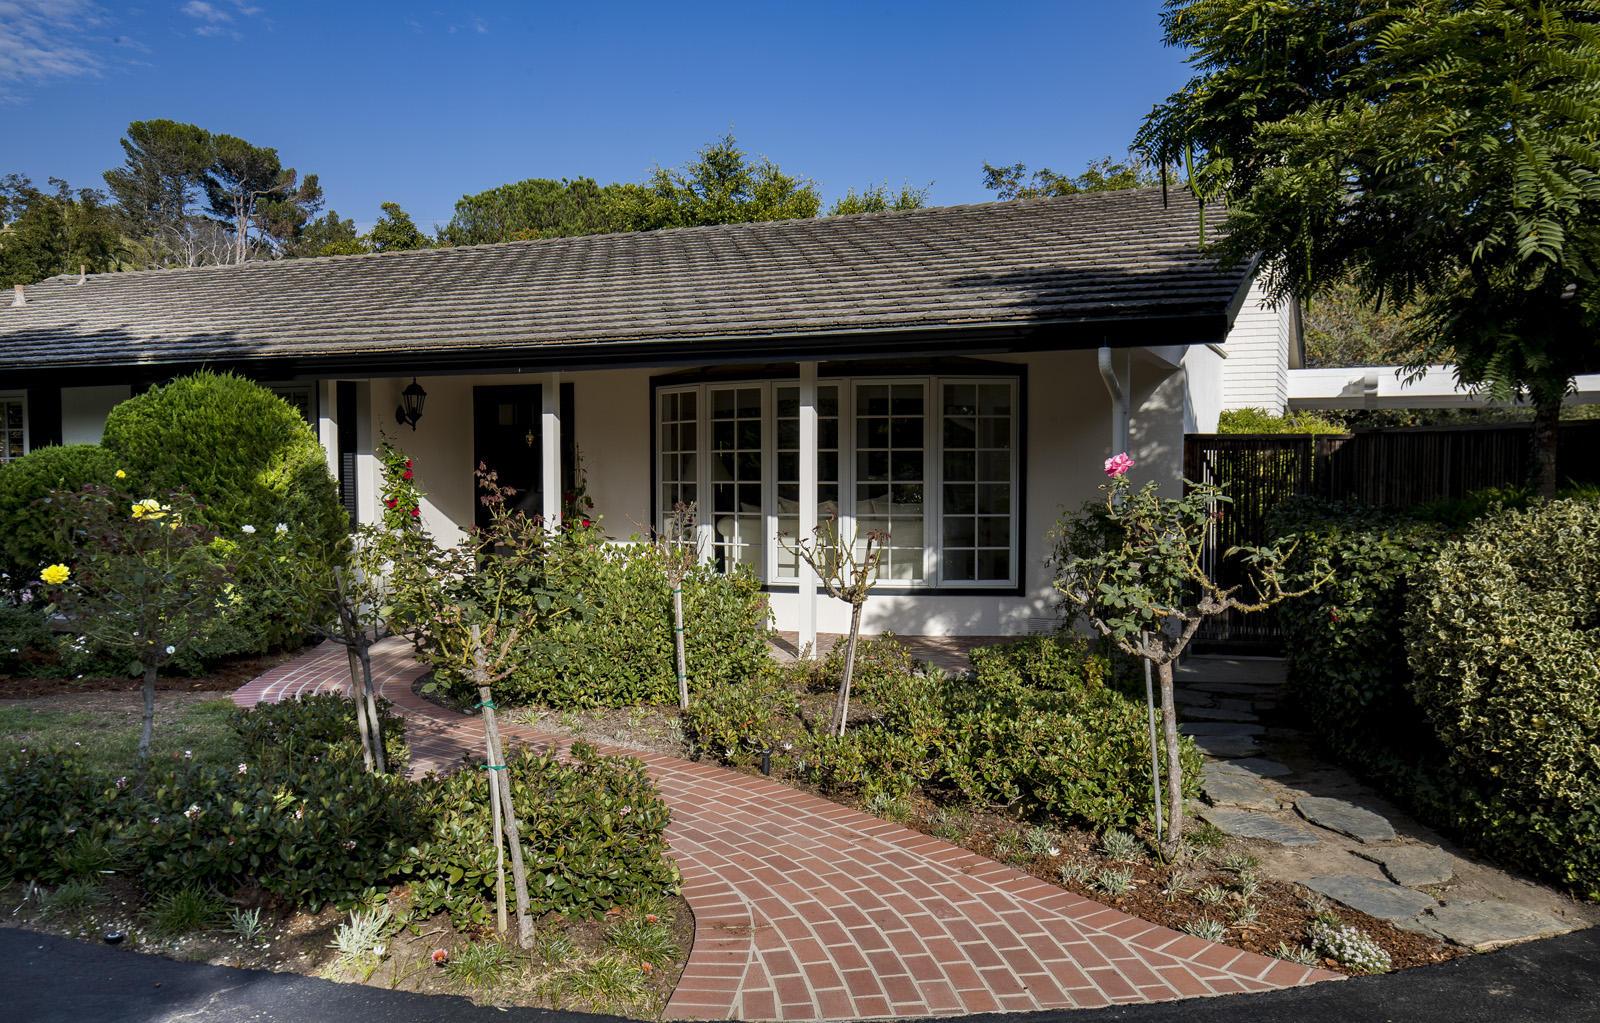 Property photo for 820 Woodland Dr Santa Barbara, California 93108 - 16-3234